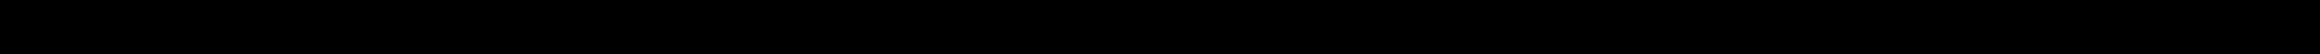 MANN-FILTER 6Q0 201 051 A, 6Q0 201 051 C, 6Q0 201 051 J, 6Q0 201 051 C, L 6Q0 201 051 J Palivovy filtr